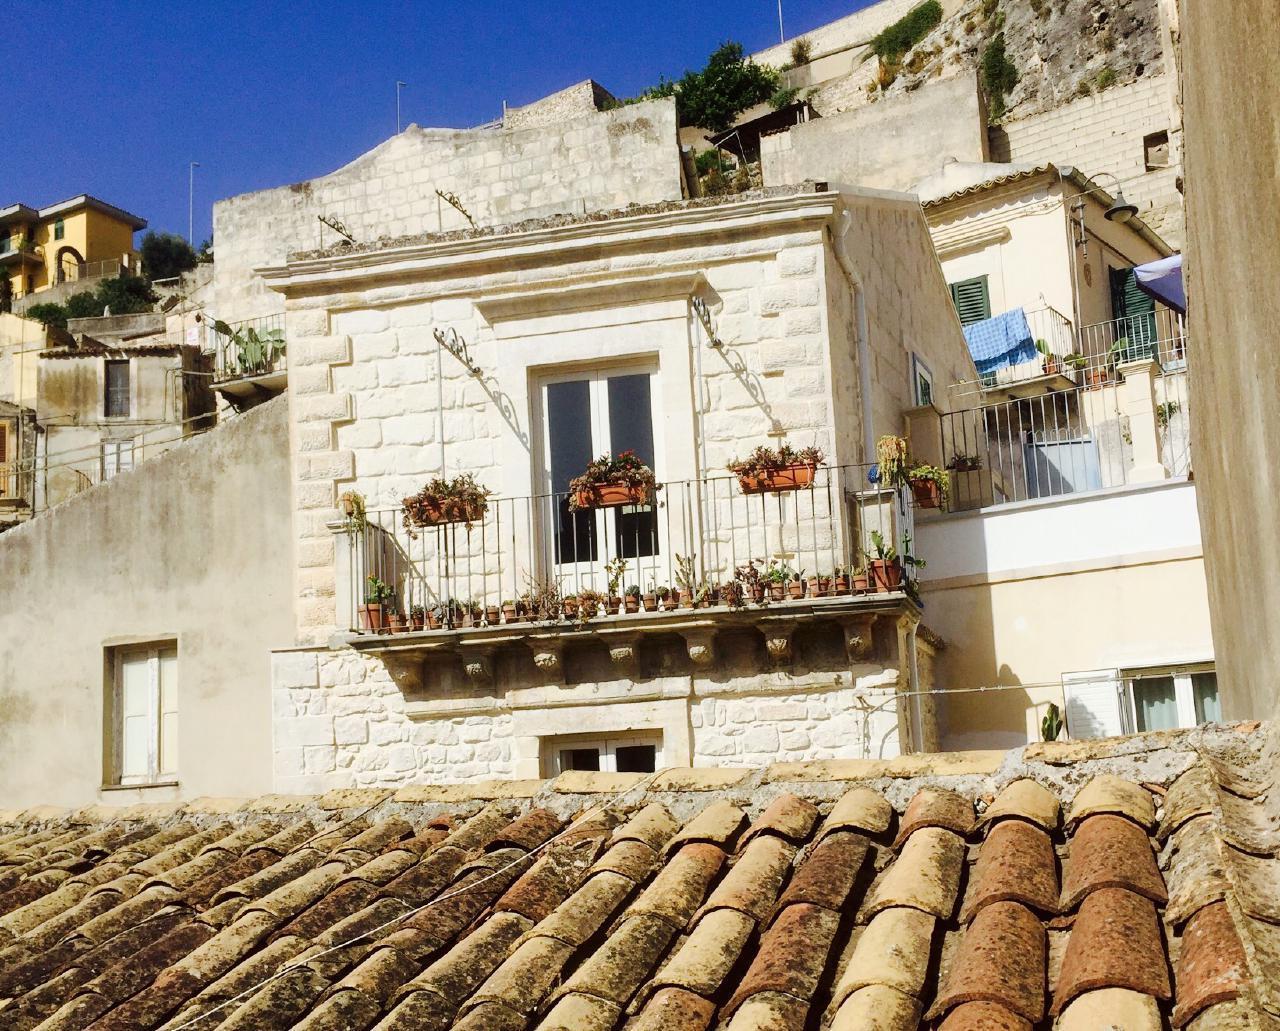 Maison de vacances Terrazza Barocca (1648450), Modica, Ragusa, Sicile, Italie, image 5